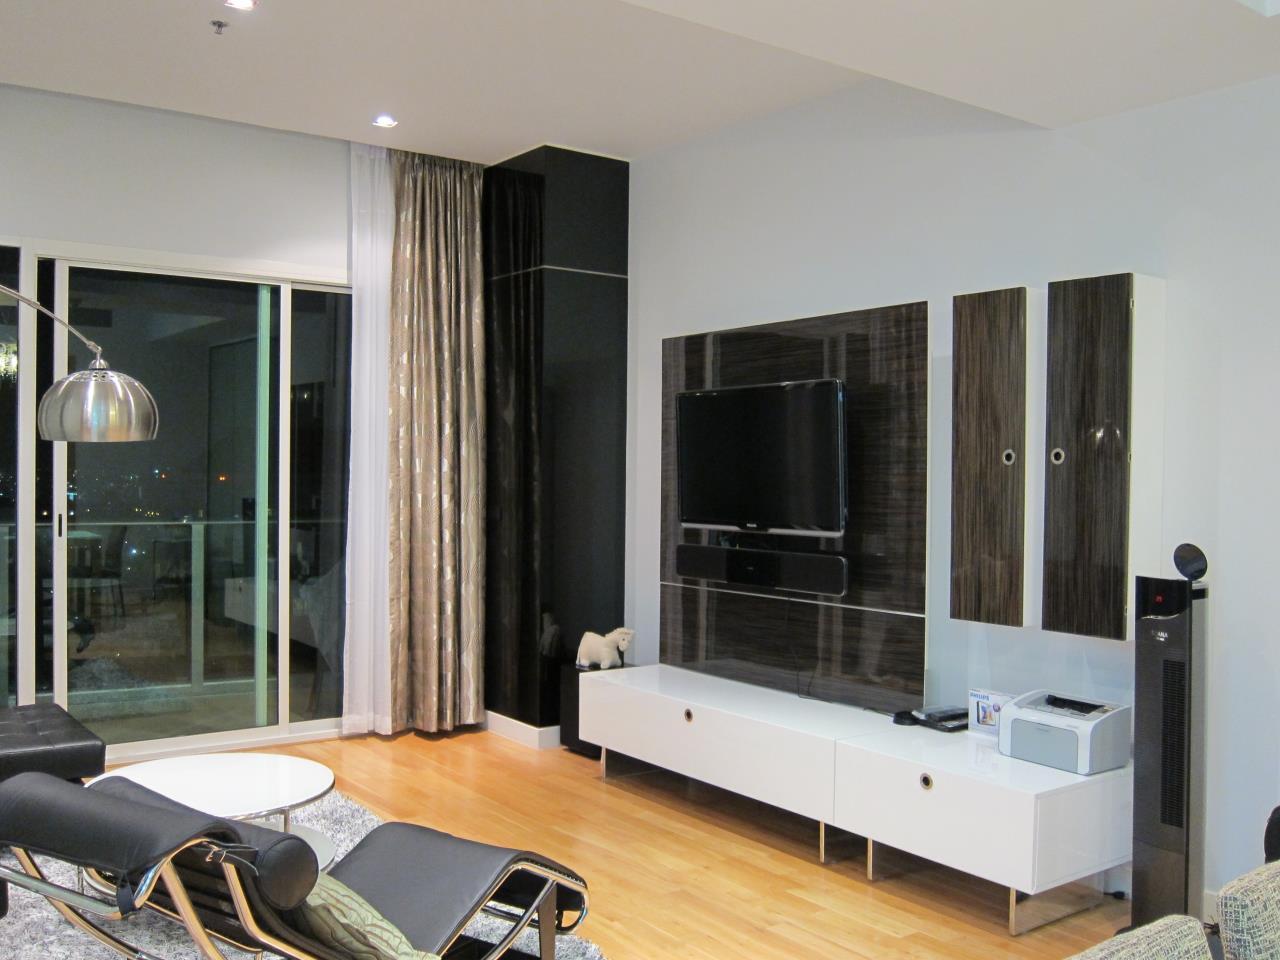 Piri Property Agency's 2 bedrooms Condominium  on tower B floor For Rent 2 1